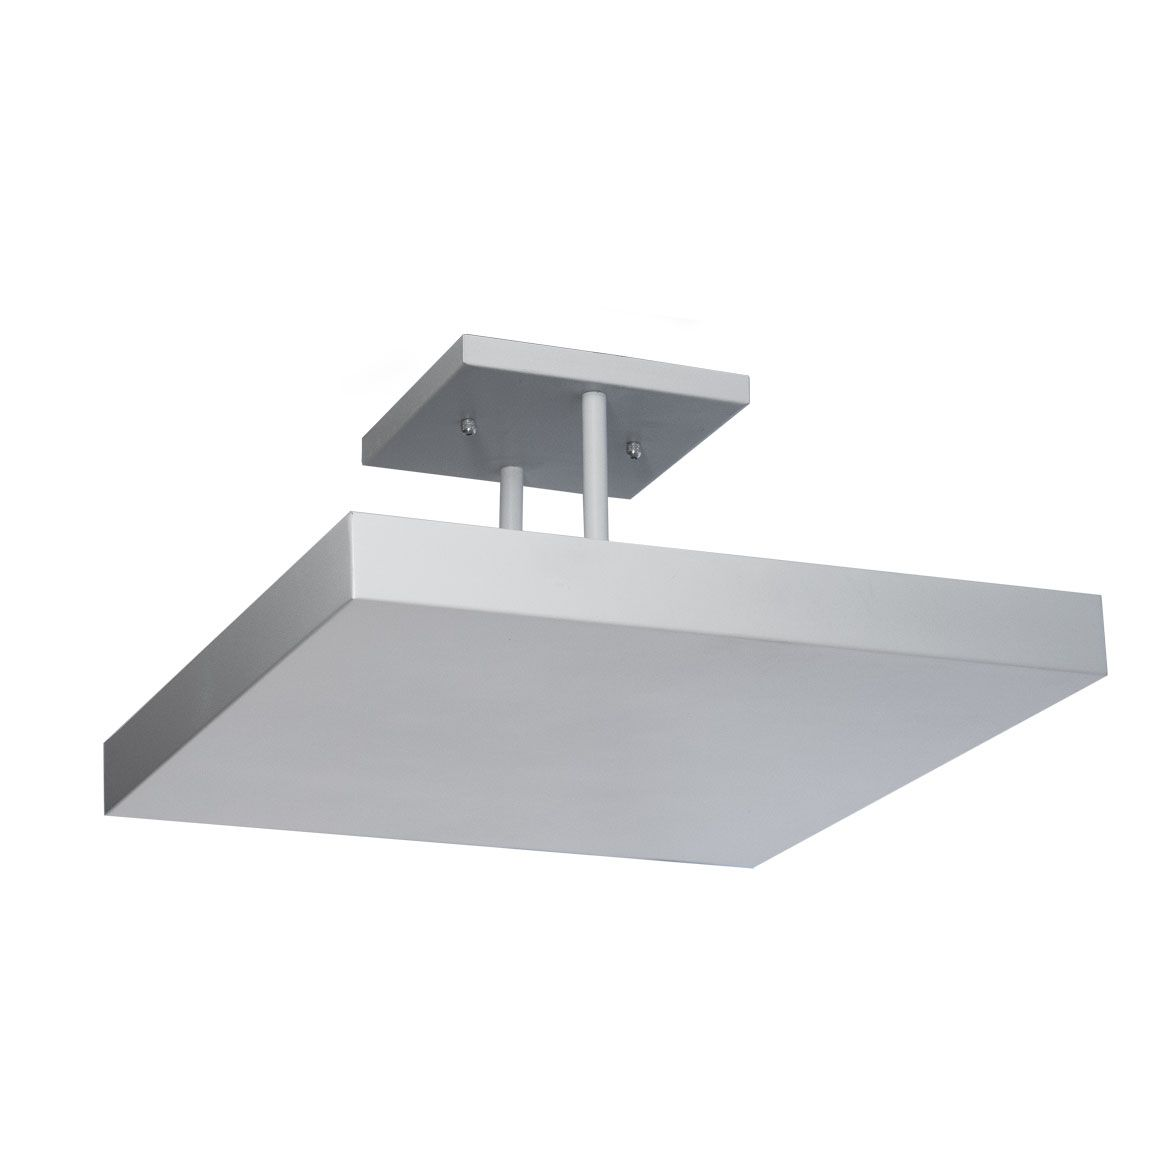 Plafon sobrepor de luz indireta 50x50cm em alumínio branco texturizado